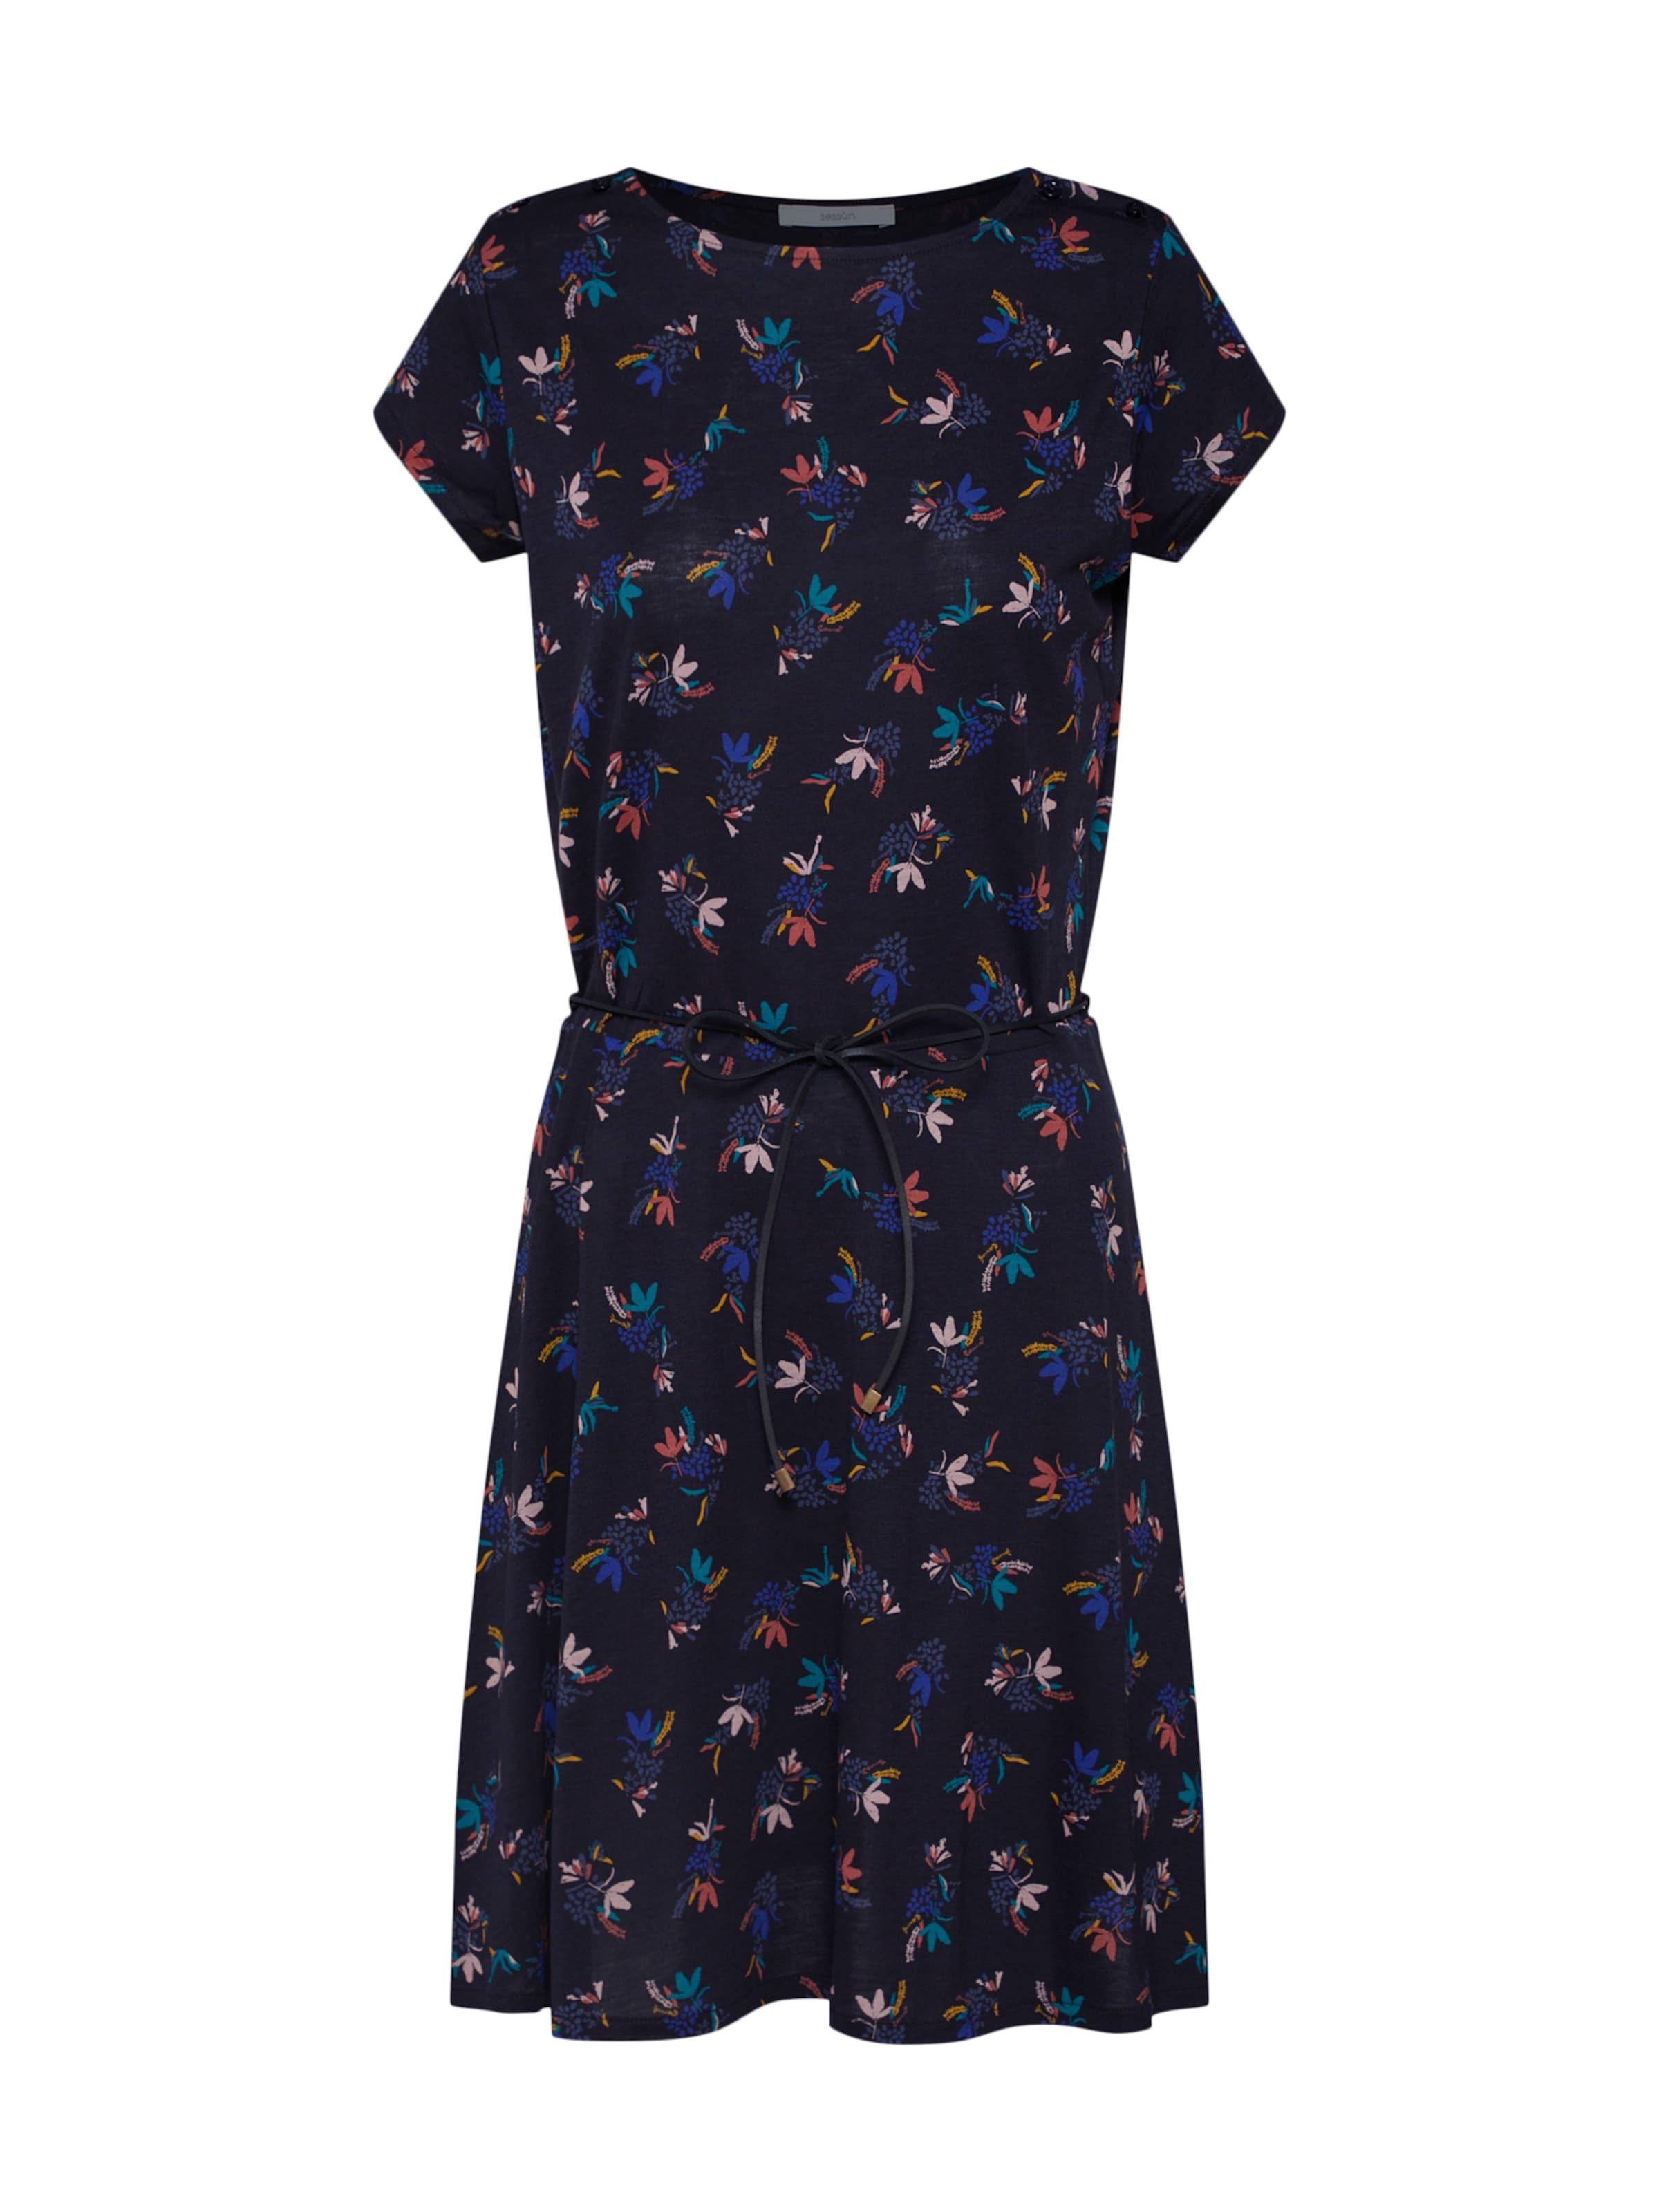 In Sessun Sessun BlauMischfarben Sessun BlauMischfarben In Sessun BlauMischfarben Kleid Kleid In Kleid In Kleid kuPXZi